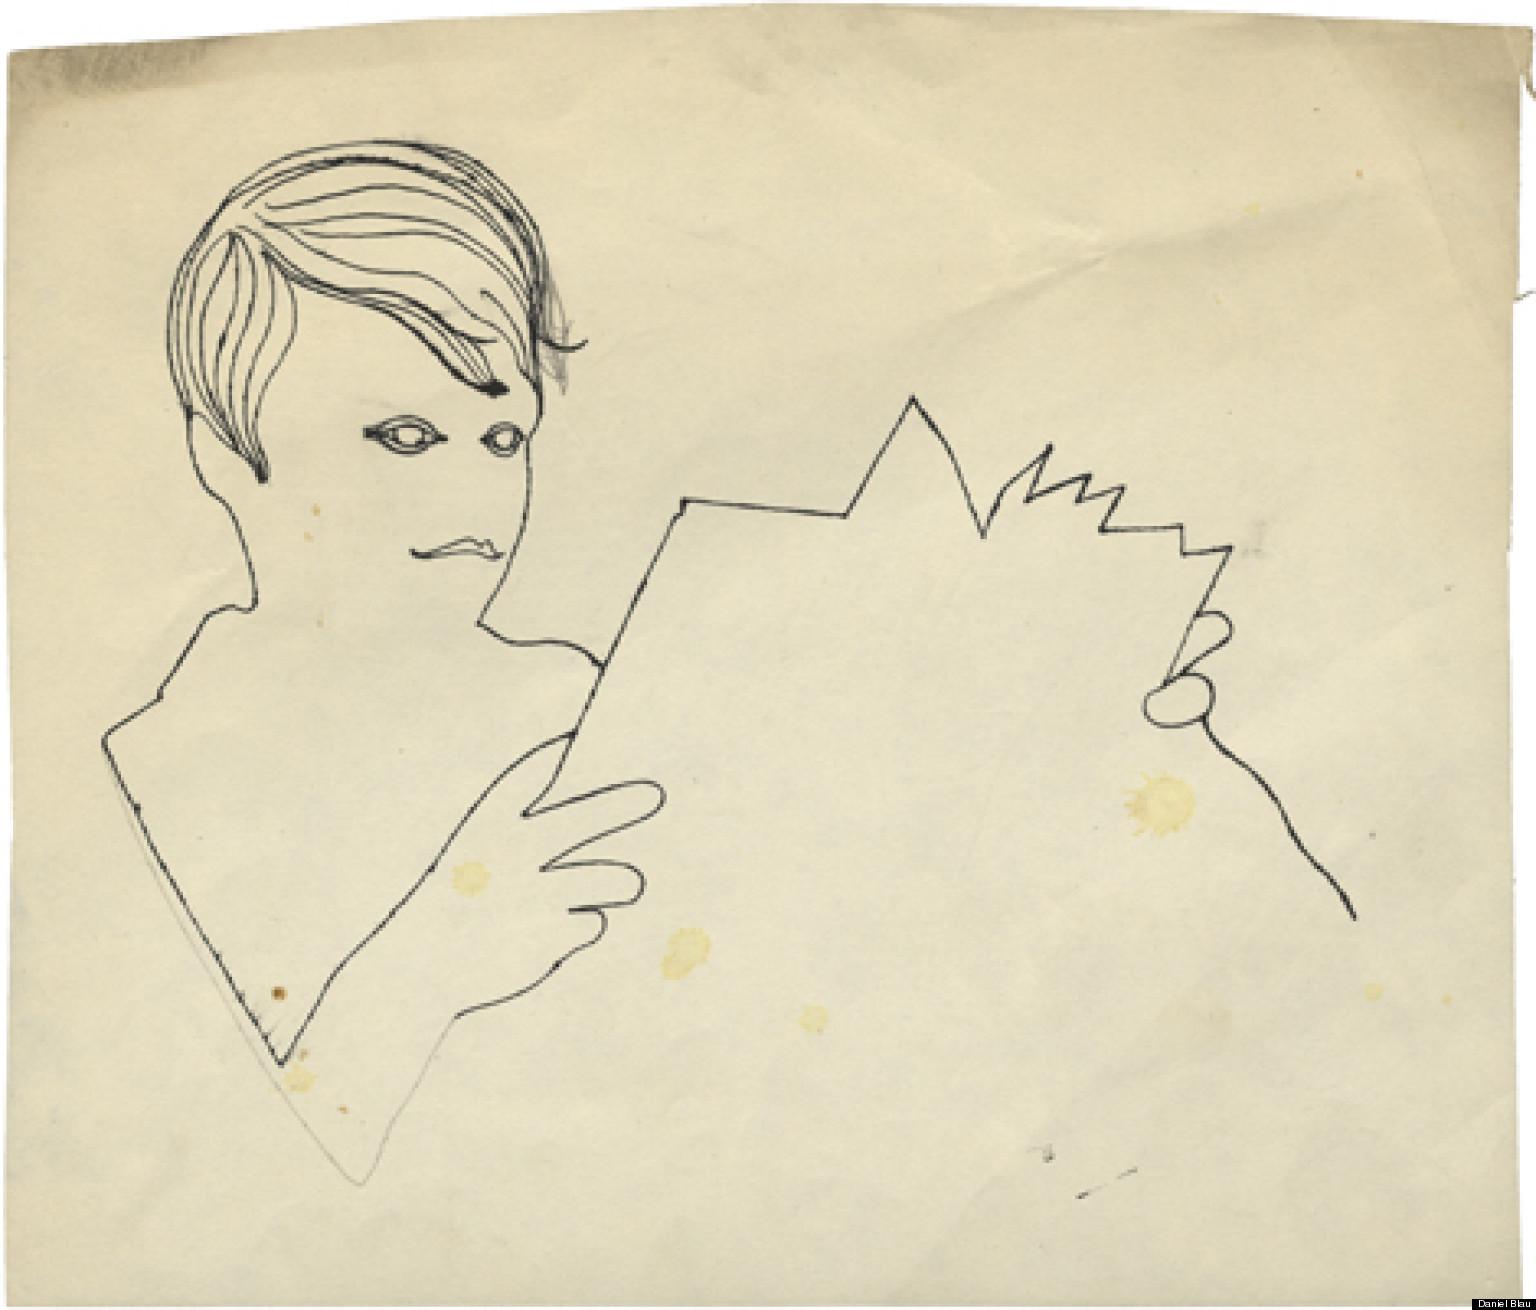 Andy warhol i disegni inediti dell 39 artista foto for Ricerca su andy warhol